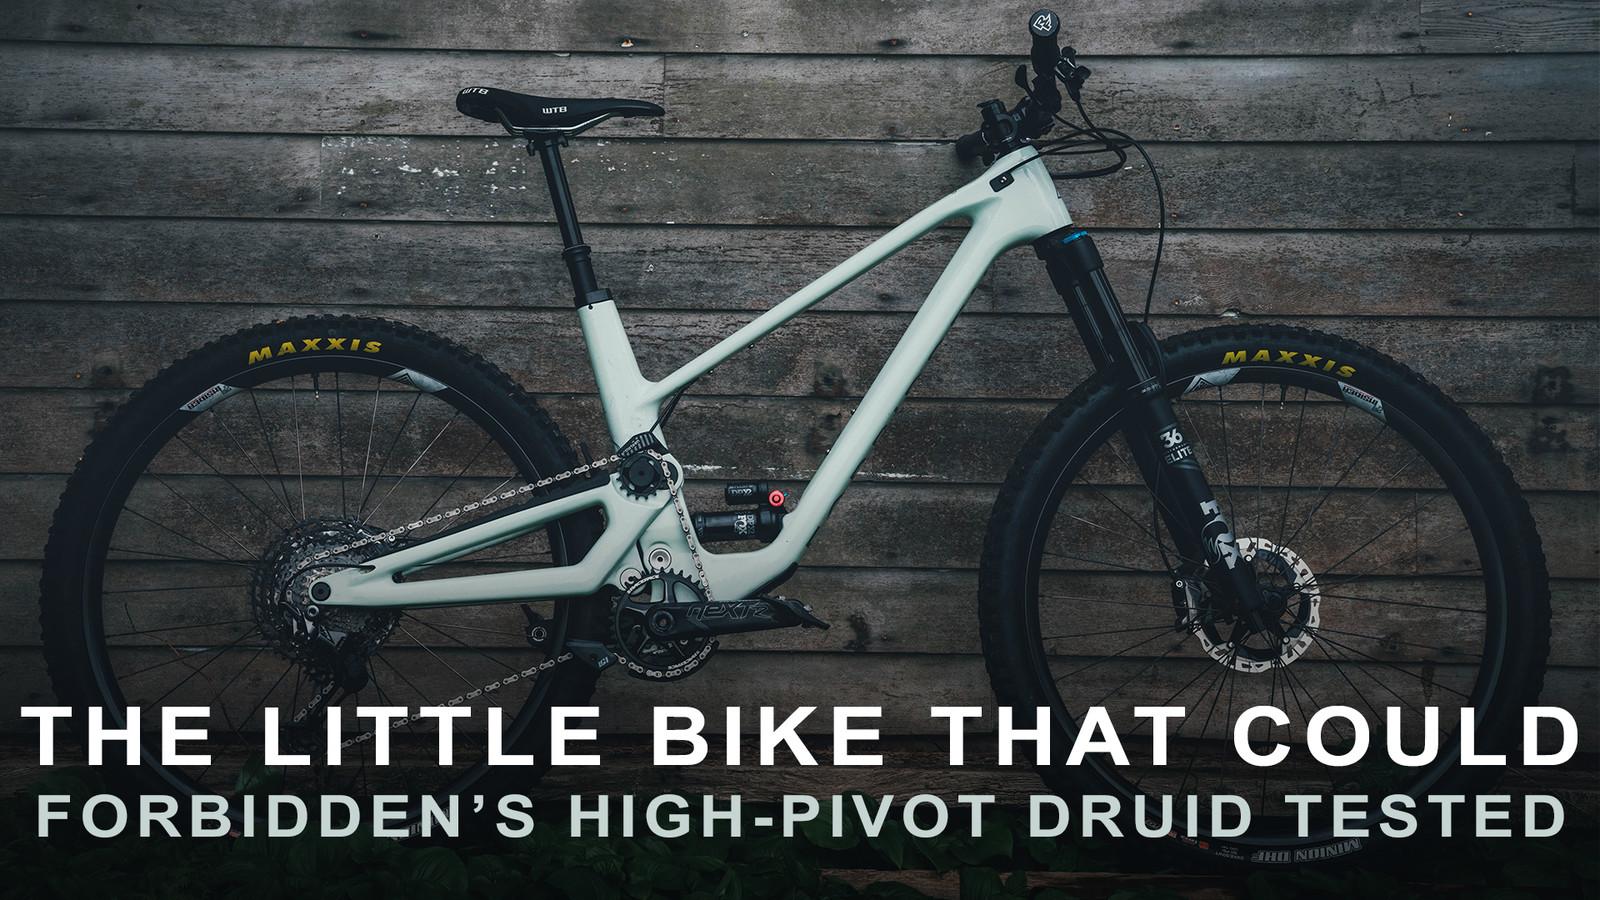 Tested: Forbidden's High-Pivot Druid Trail Bike